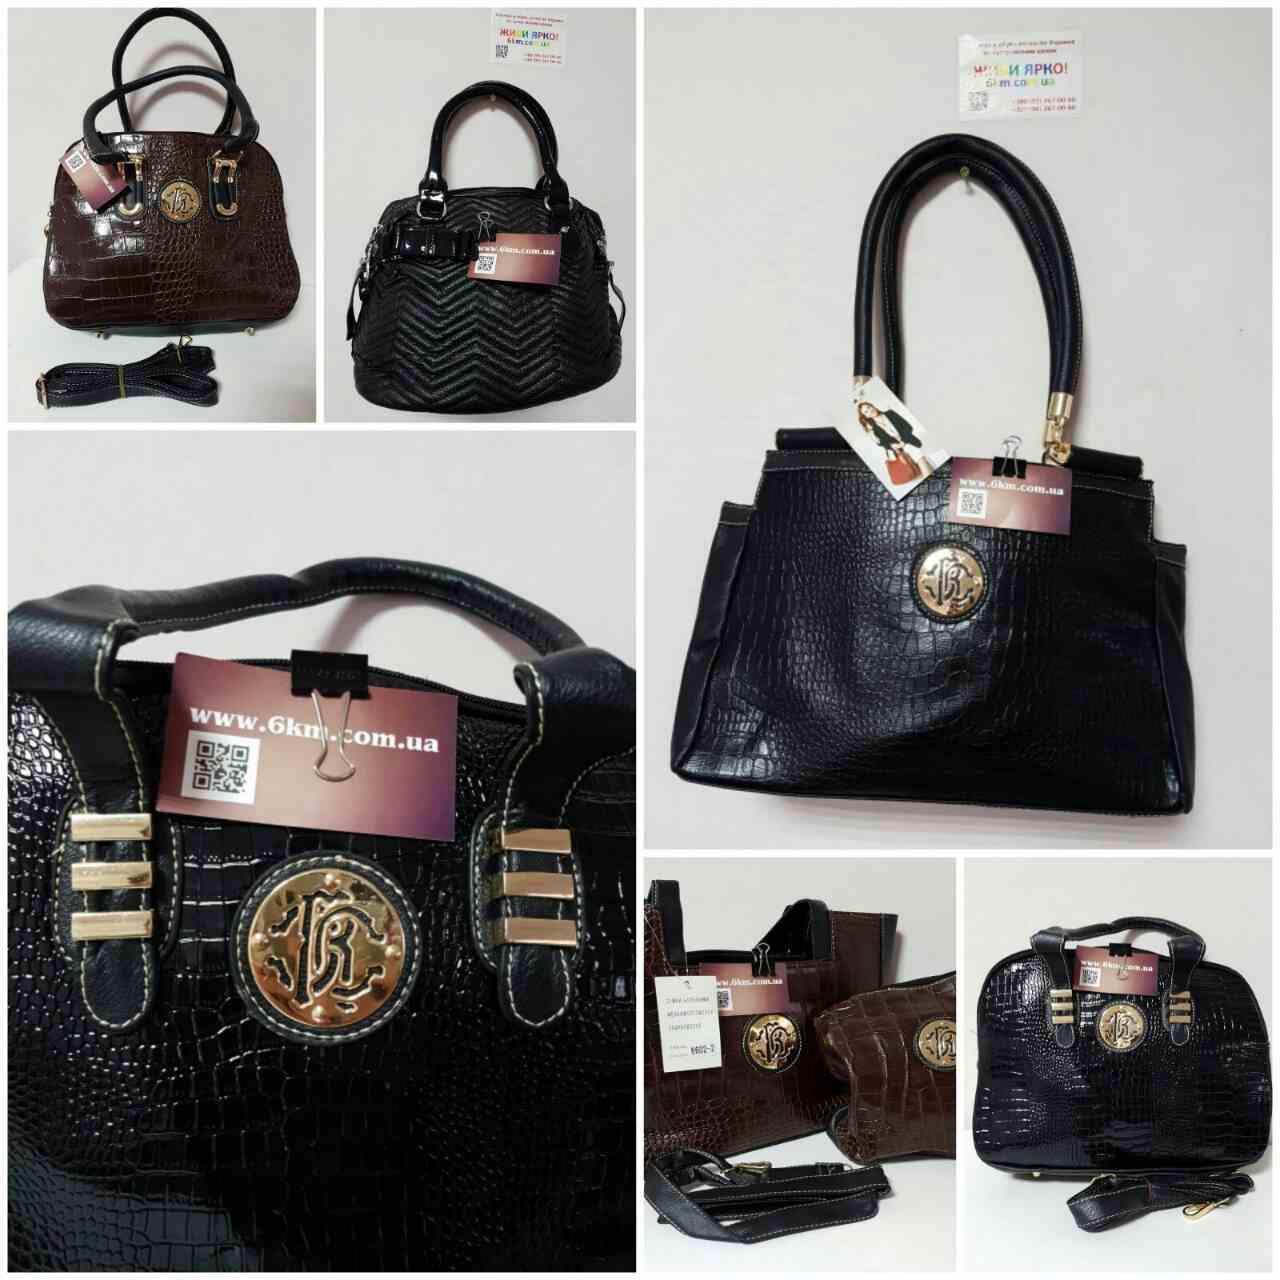 fe6f4491143e Женская сумка Roberto Cavalli от 5 шт: продажа, цена в Одессе. женские  сумочки и клатчи от ...